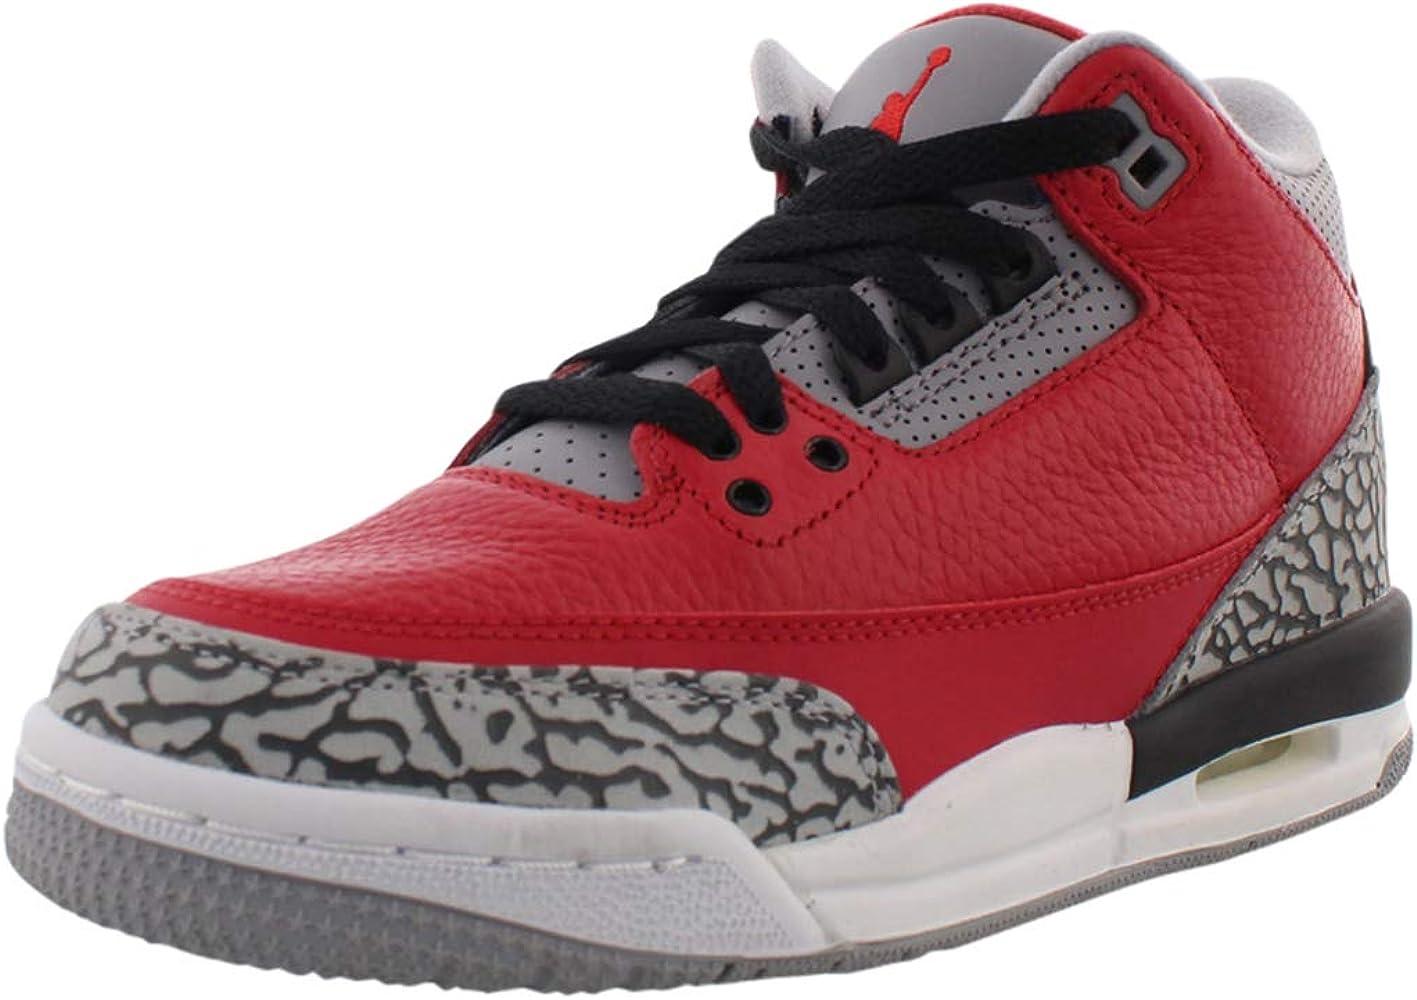 Nike Air Jordan 3 Retro Se (gs) Big Kids Cq0488-600